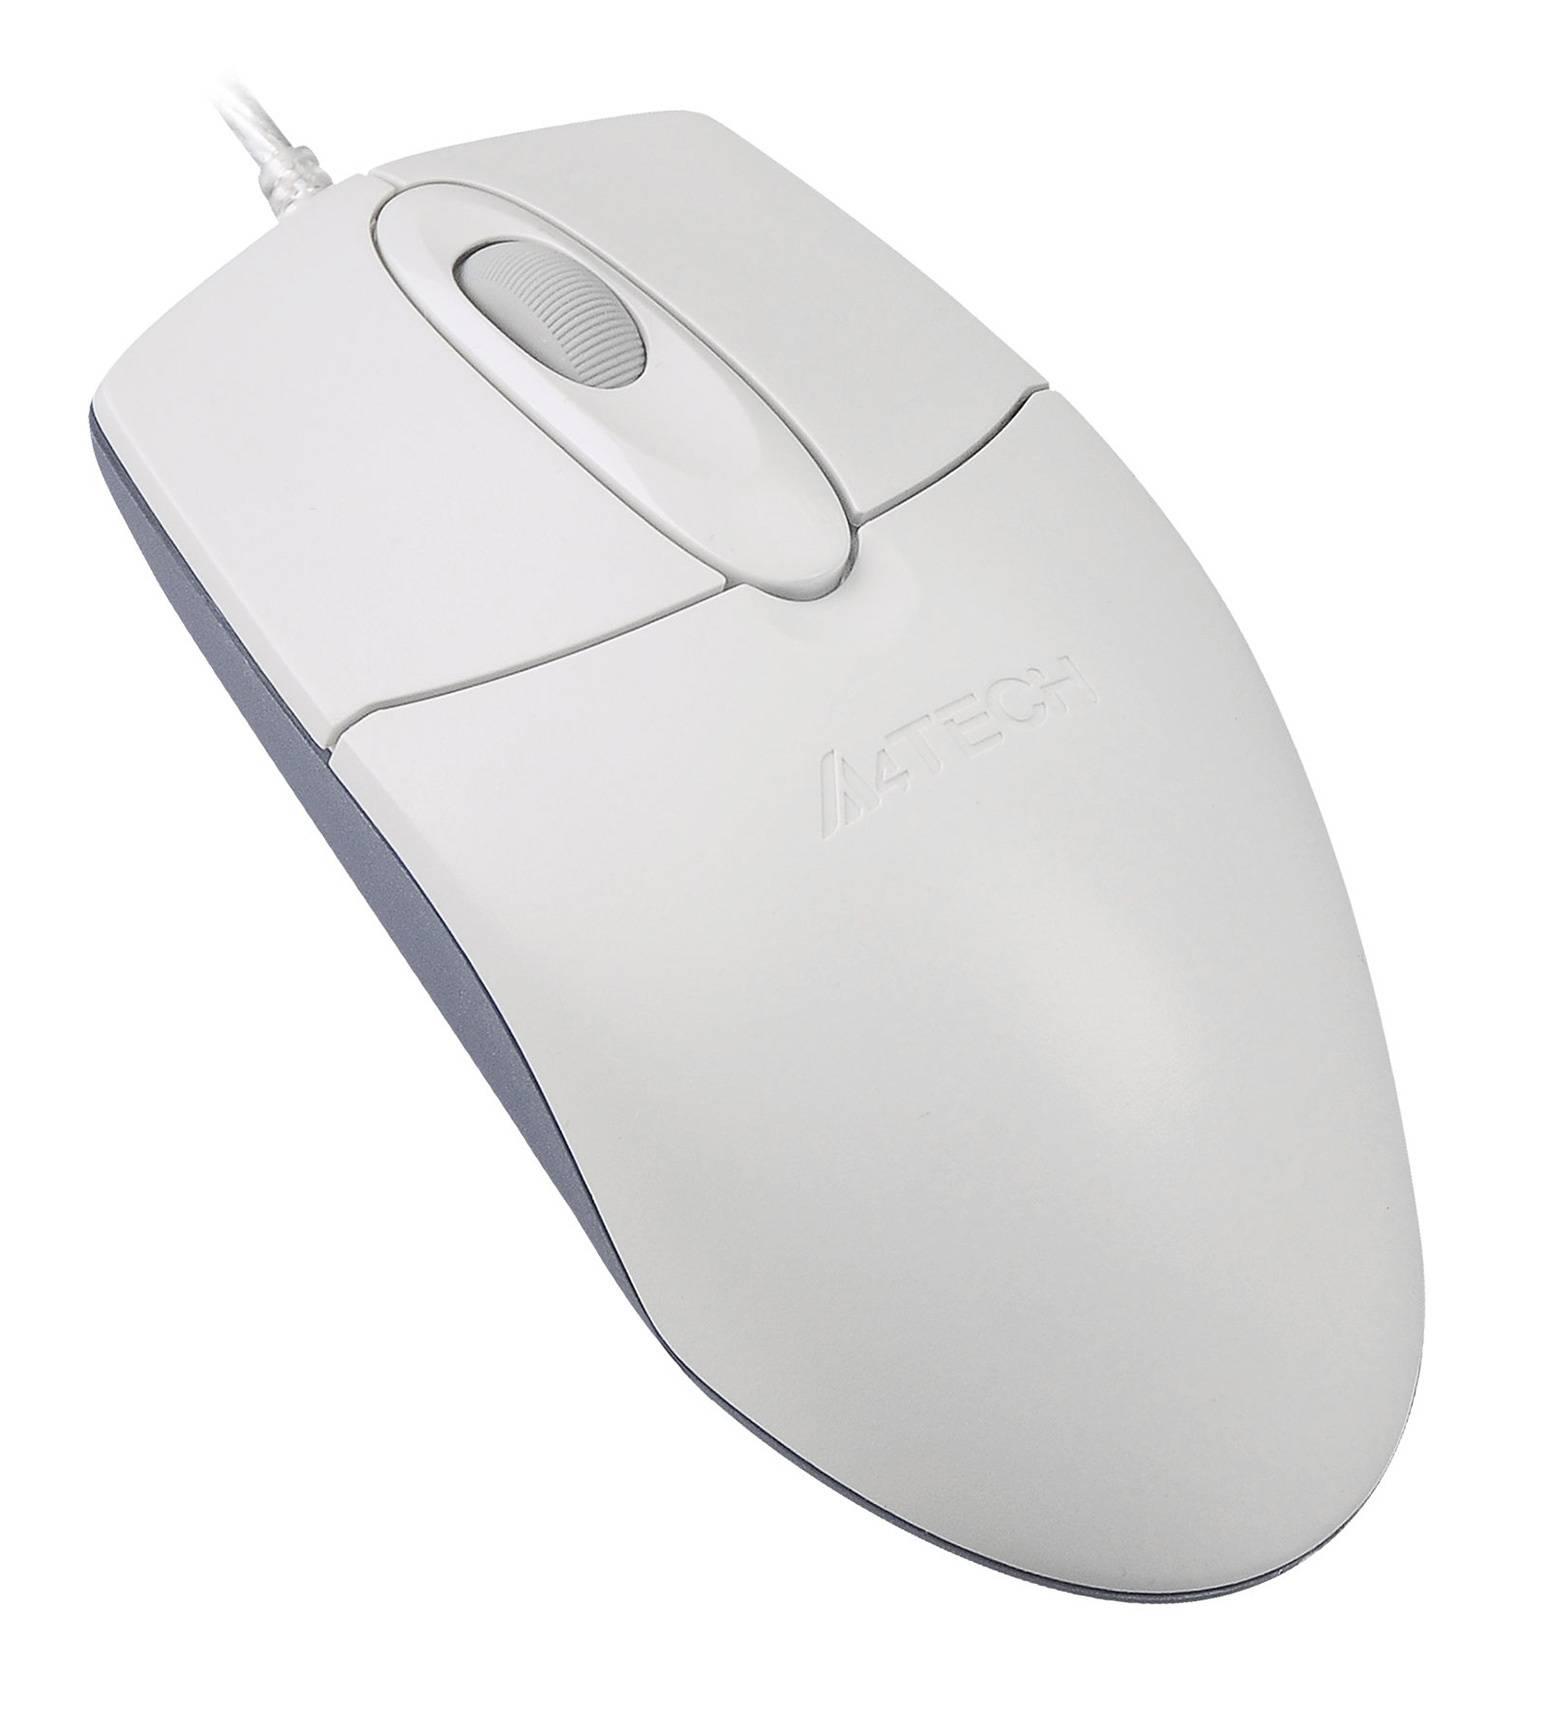 Мышь A4 OP-720 белый (OP-720 USB (WHITE)) - фото 2